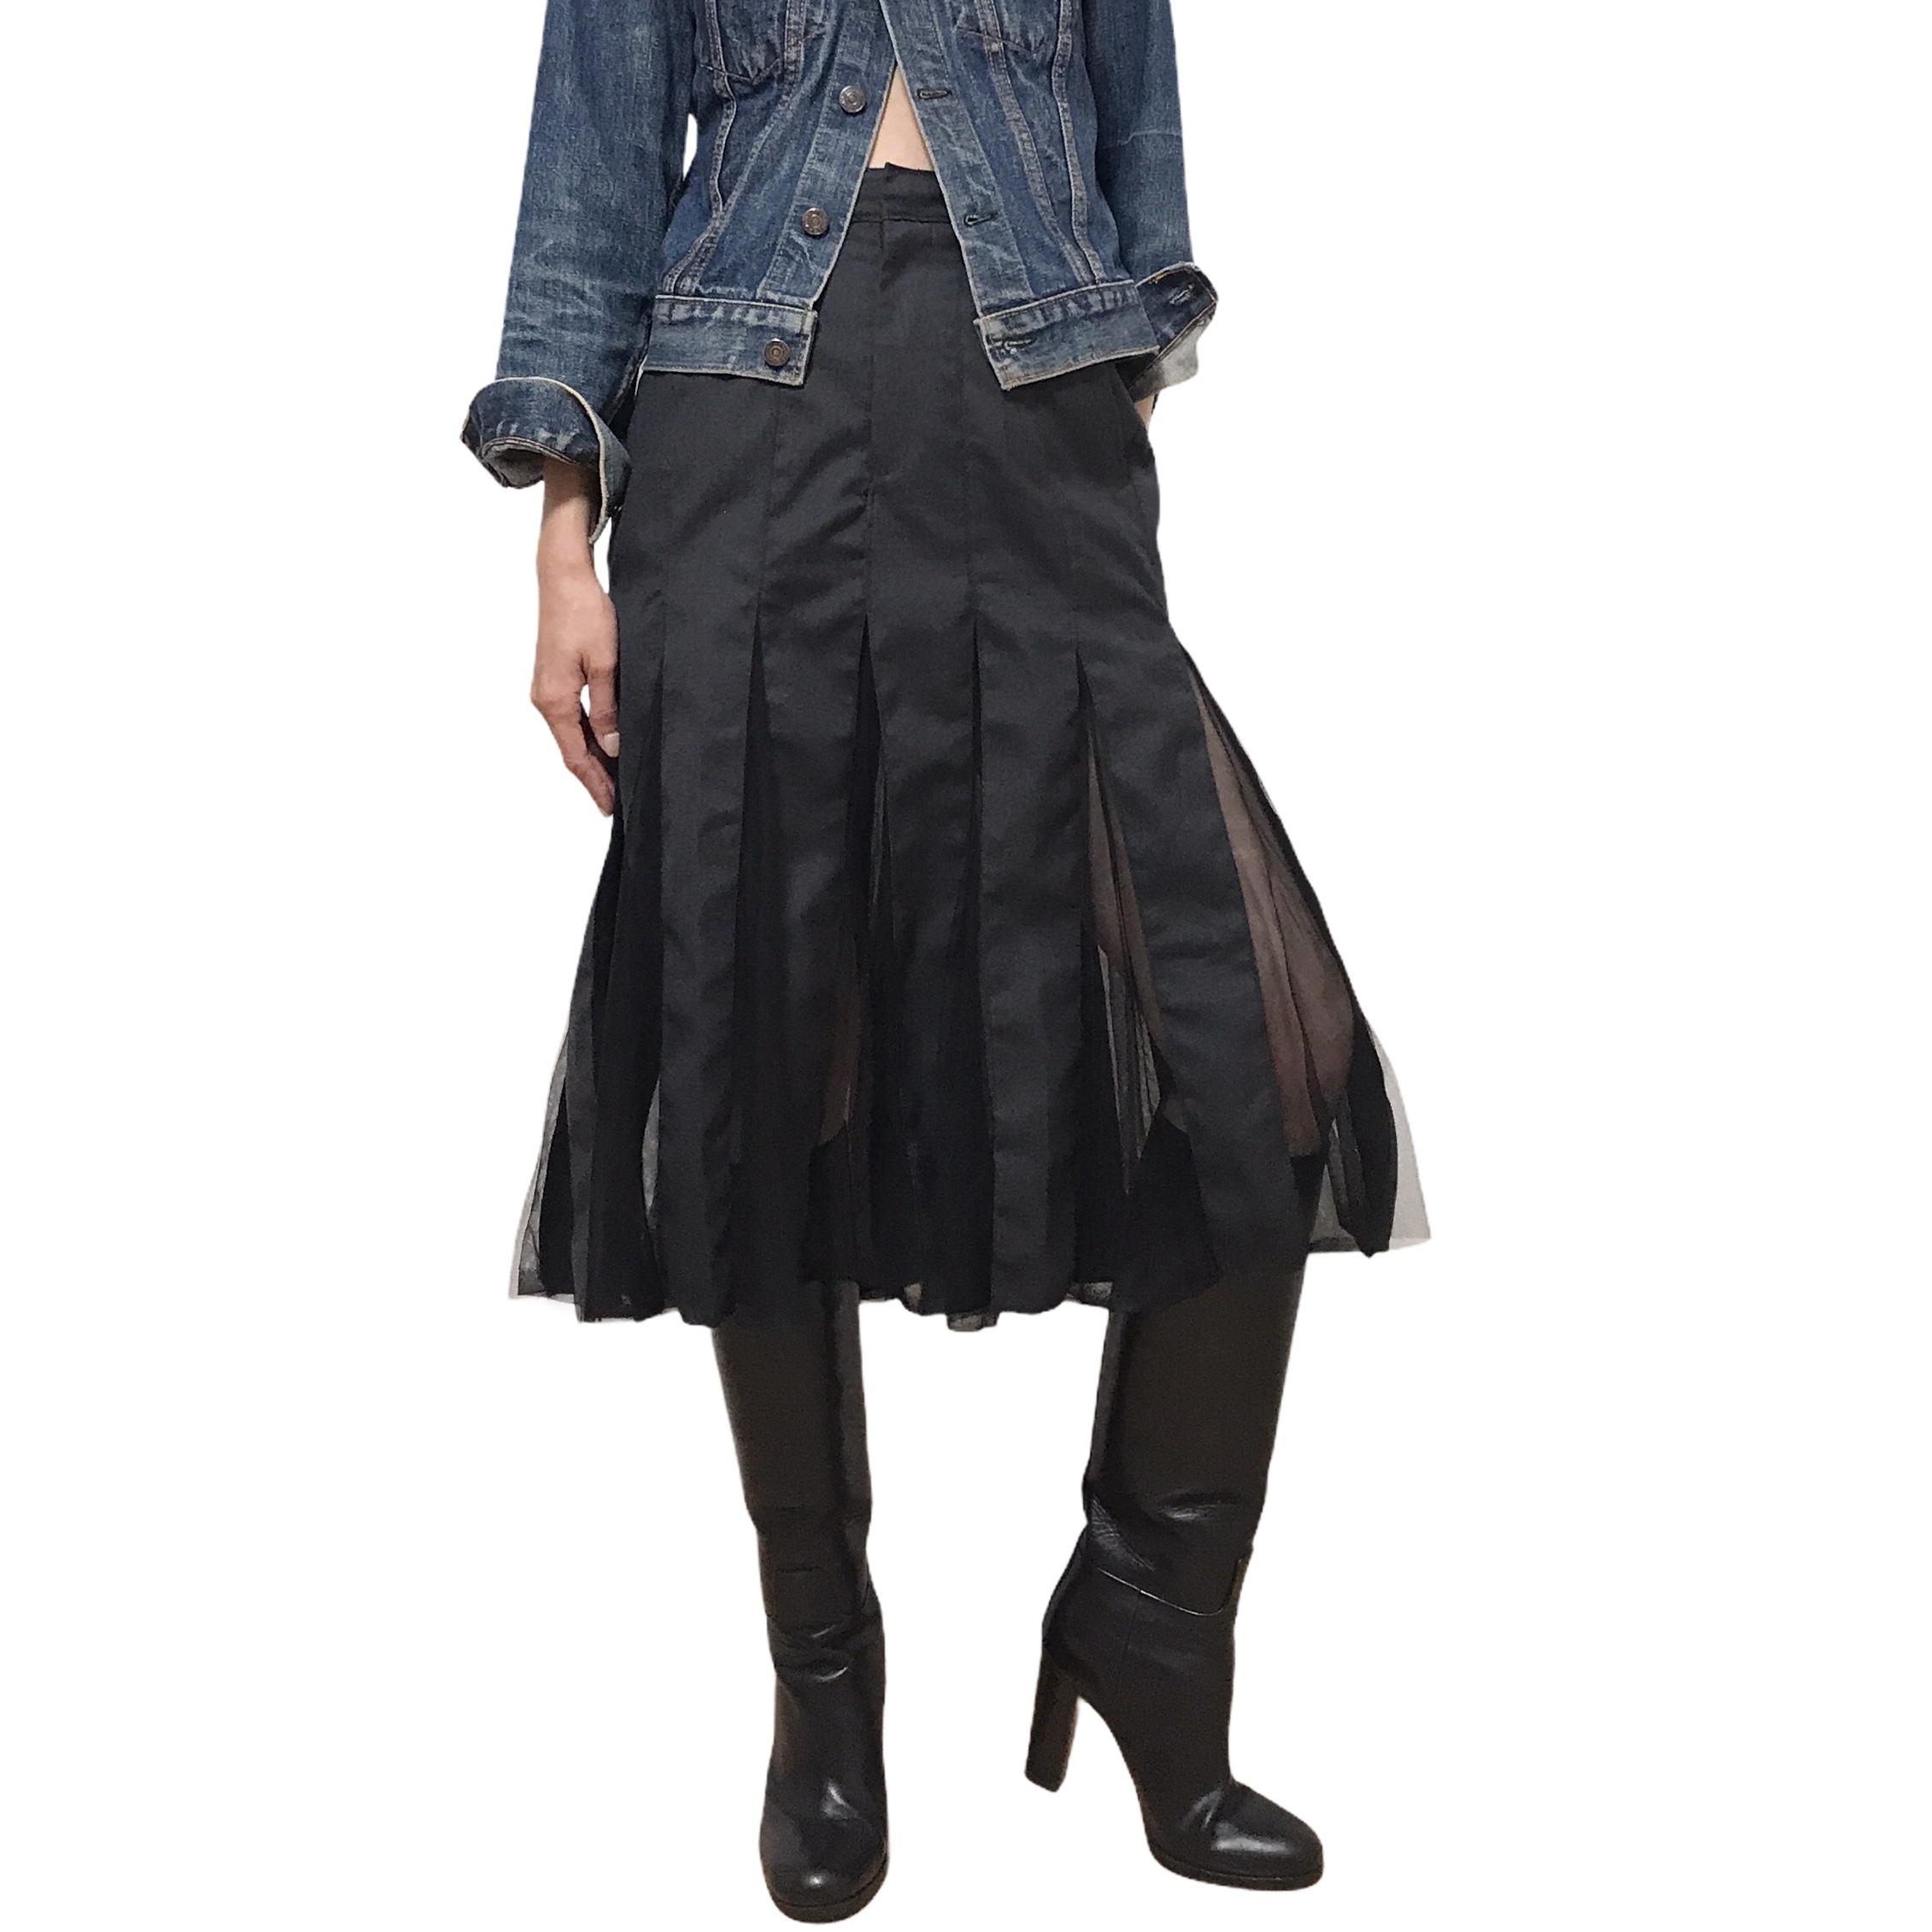 LIOT German Military Deep Slit Skirt